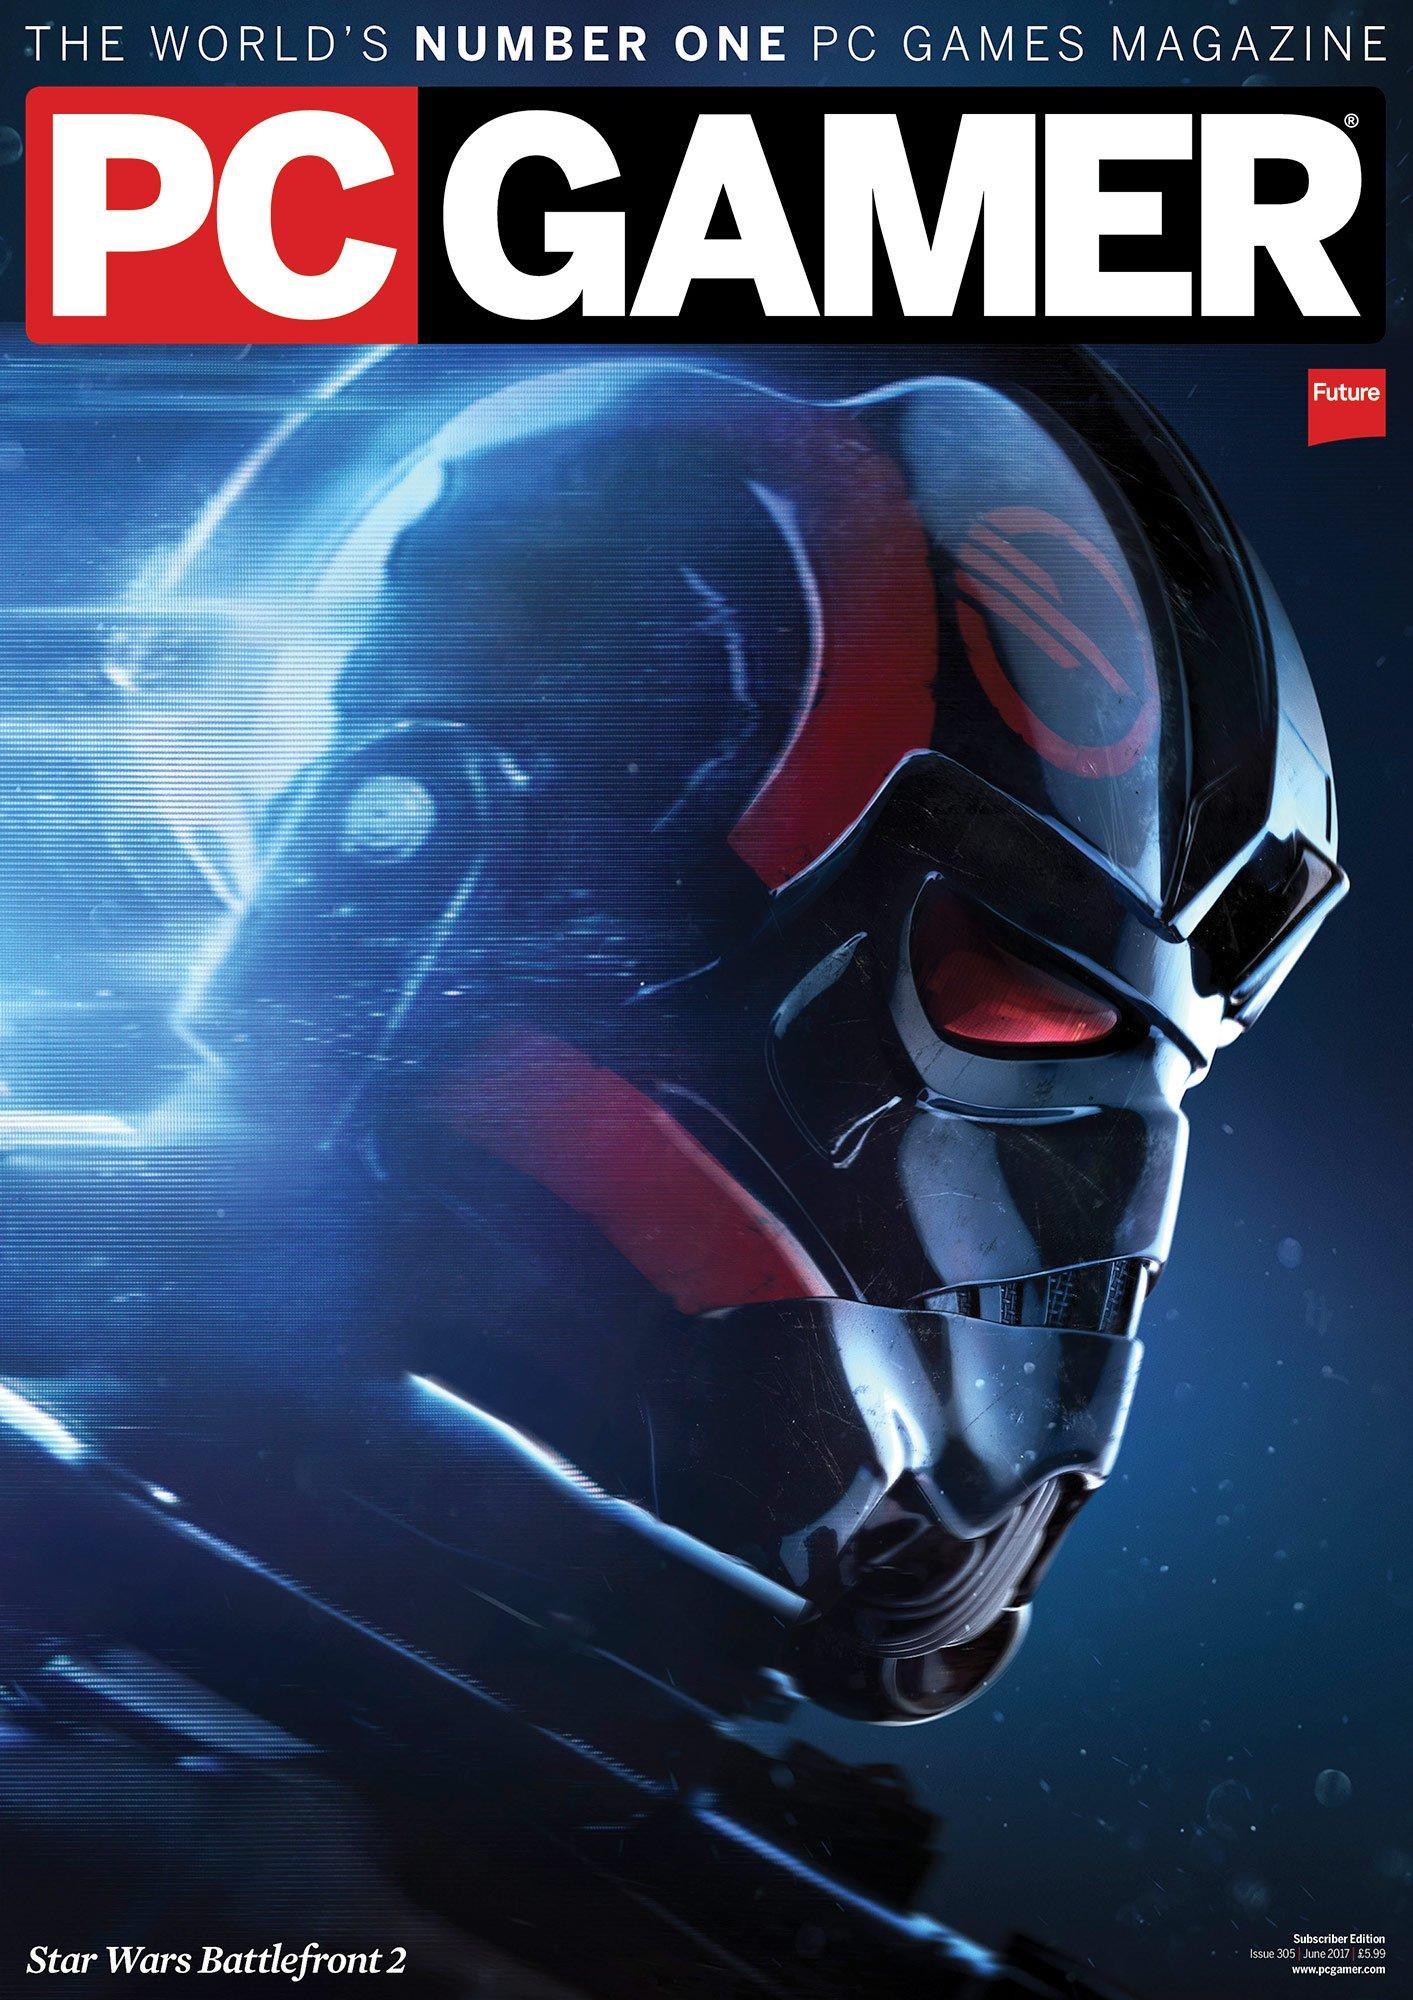 PC Gamer UK 305 June 2017 (subscriber edition)